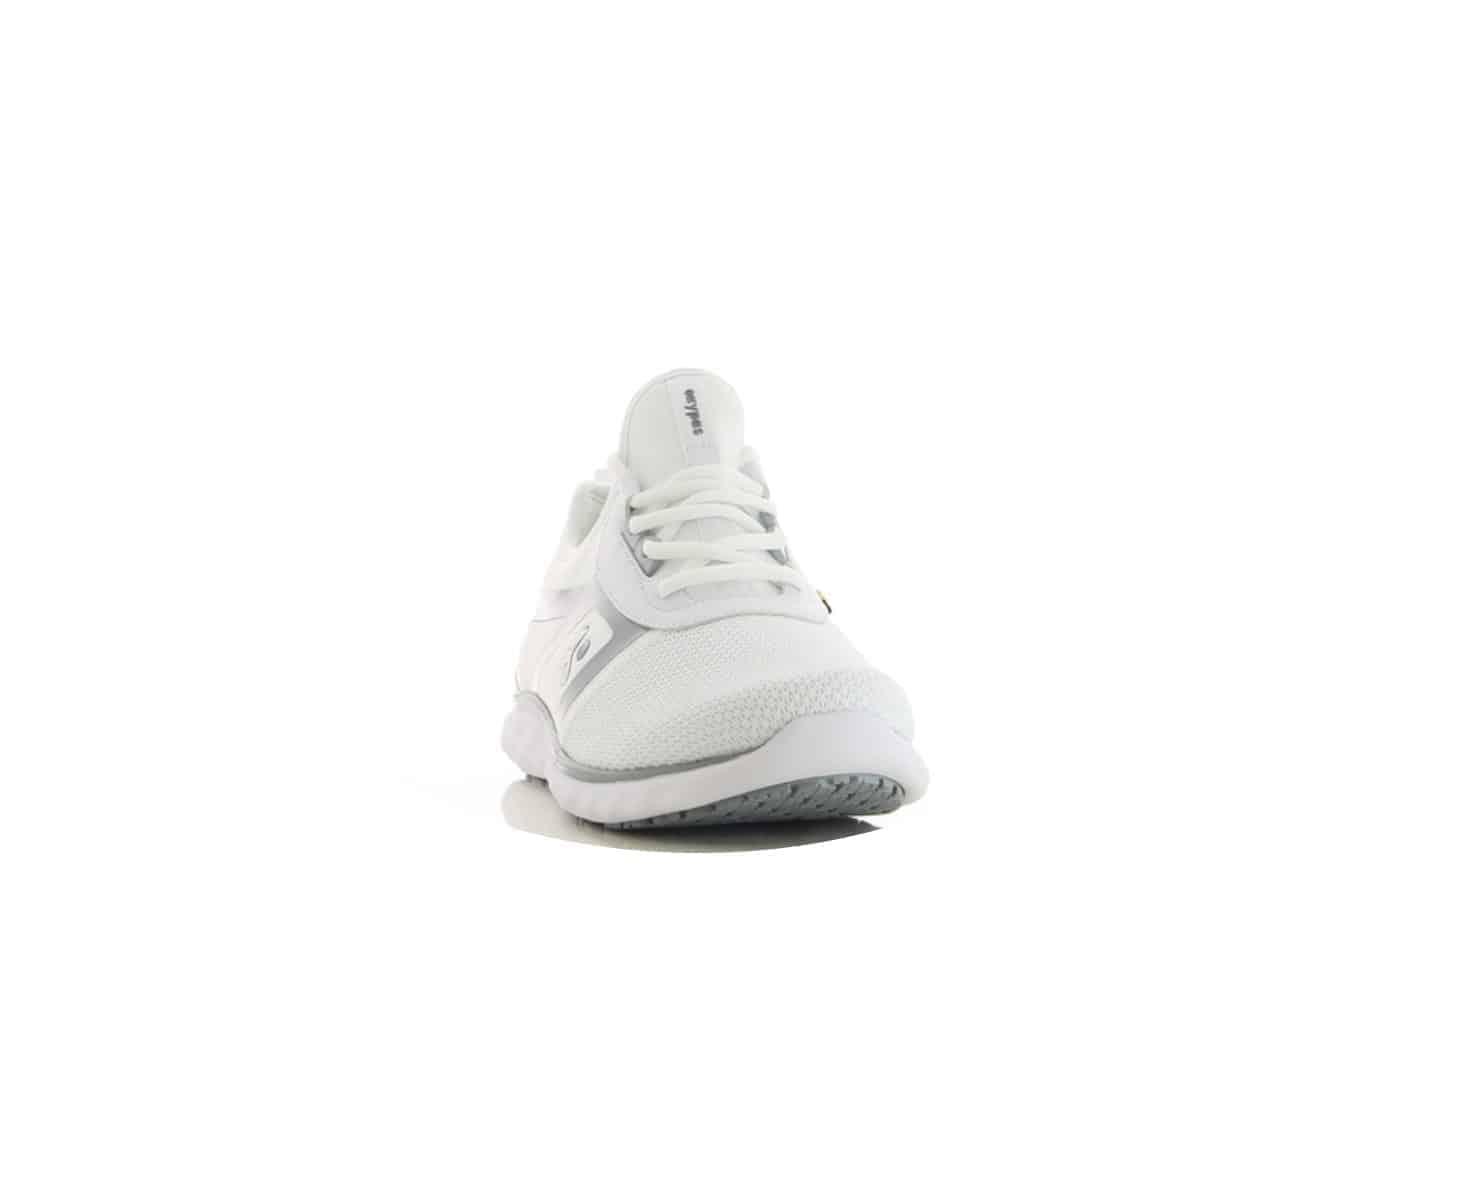 Oxypas 'Karla' Comfortable and Breathable Mesh Nursing Shoe